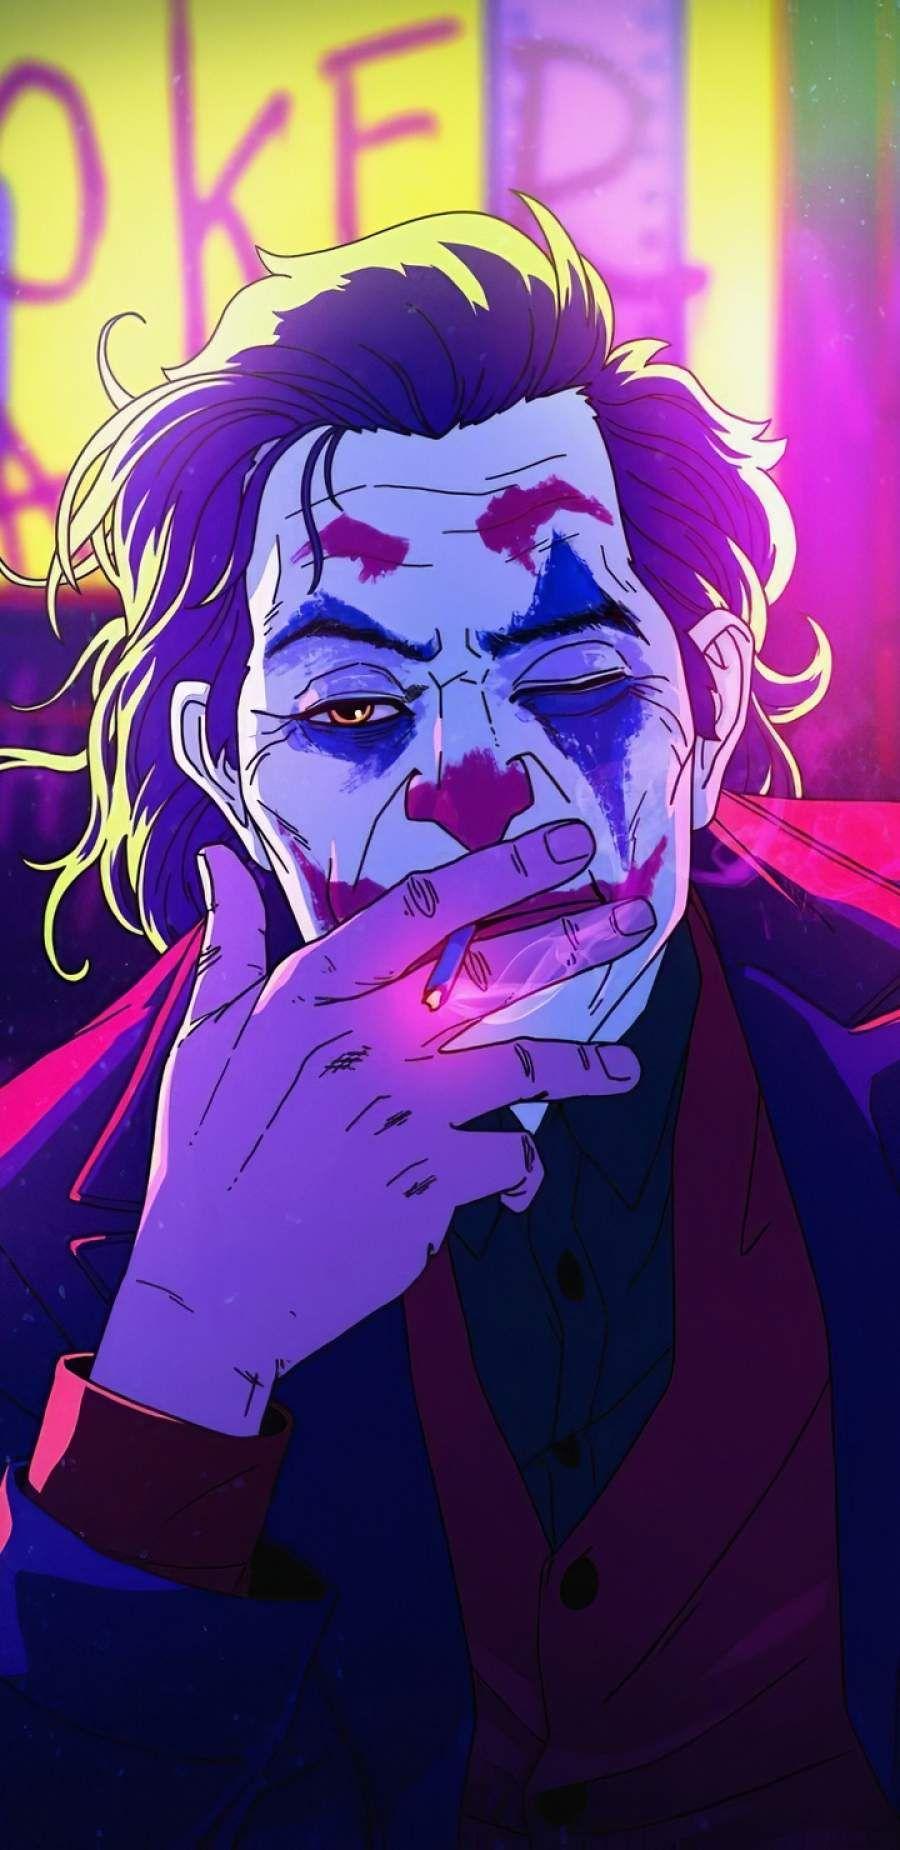 Joker Neonic Art iPhone Wallpaper in 2020 Joker